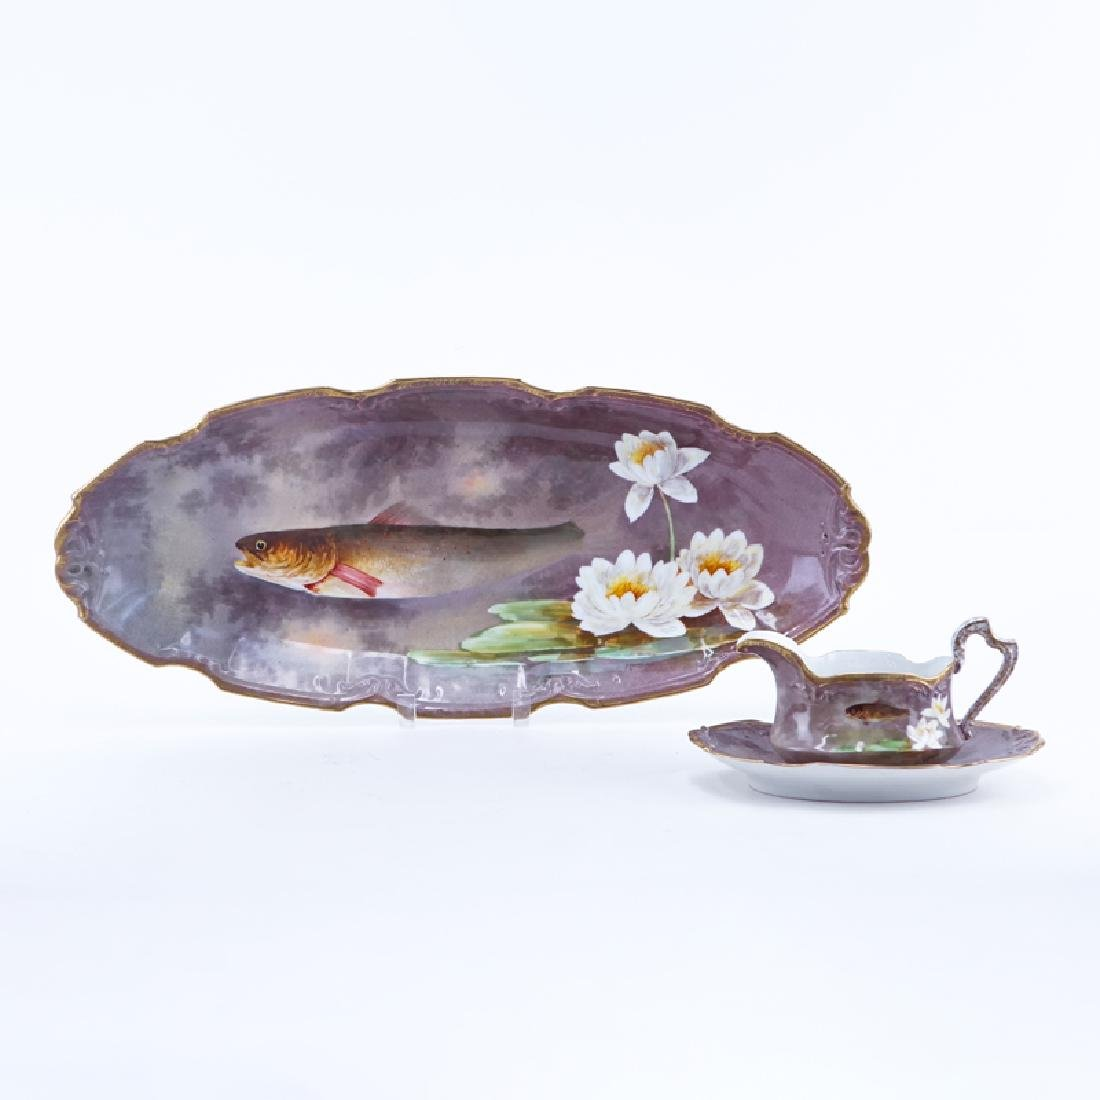 Antique Limoges Porcelain Hand Painted Fish Platter and